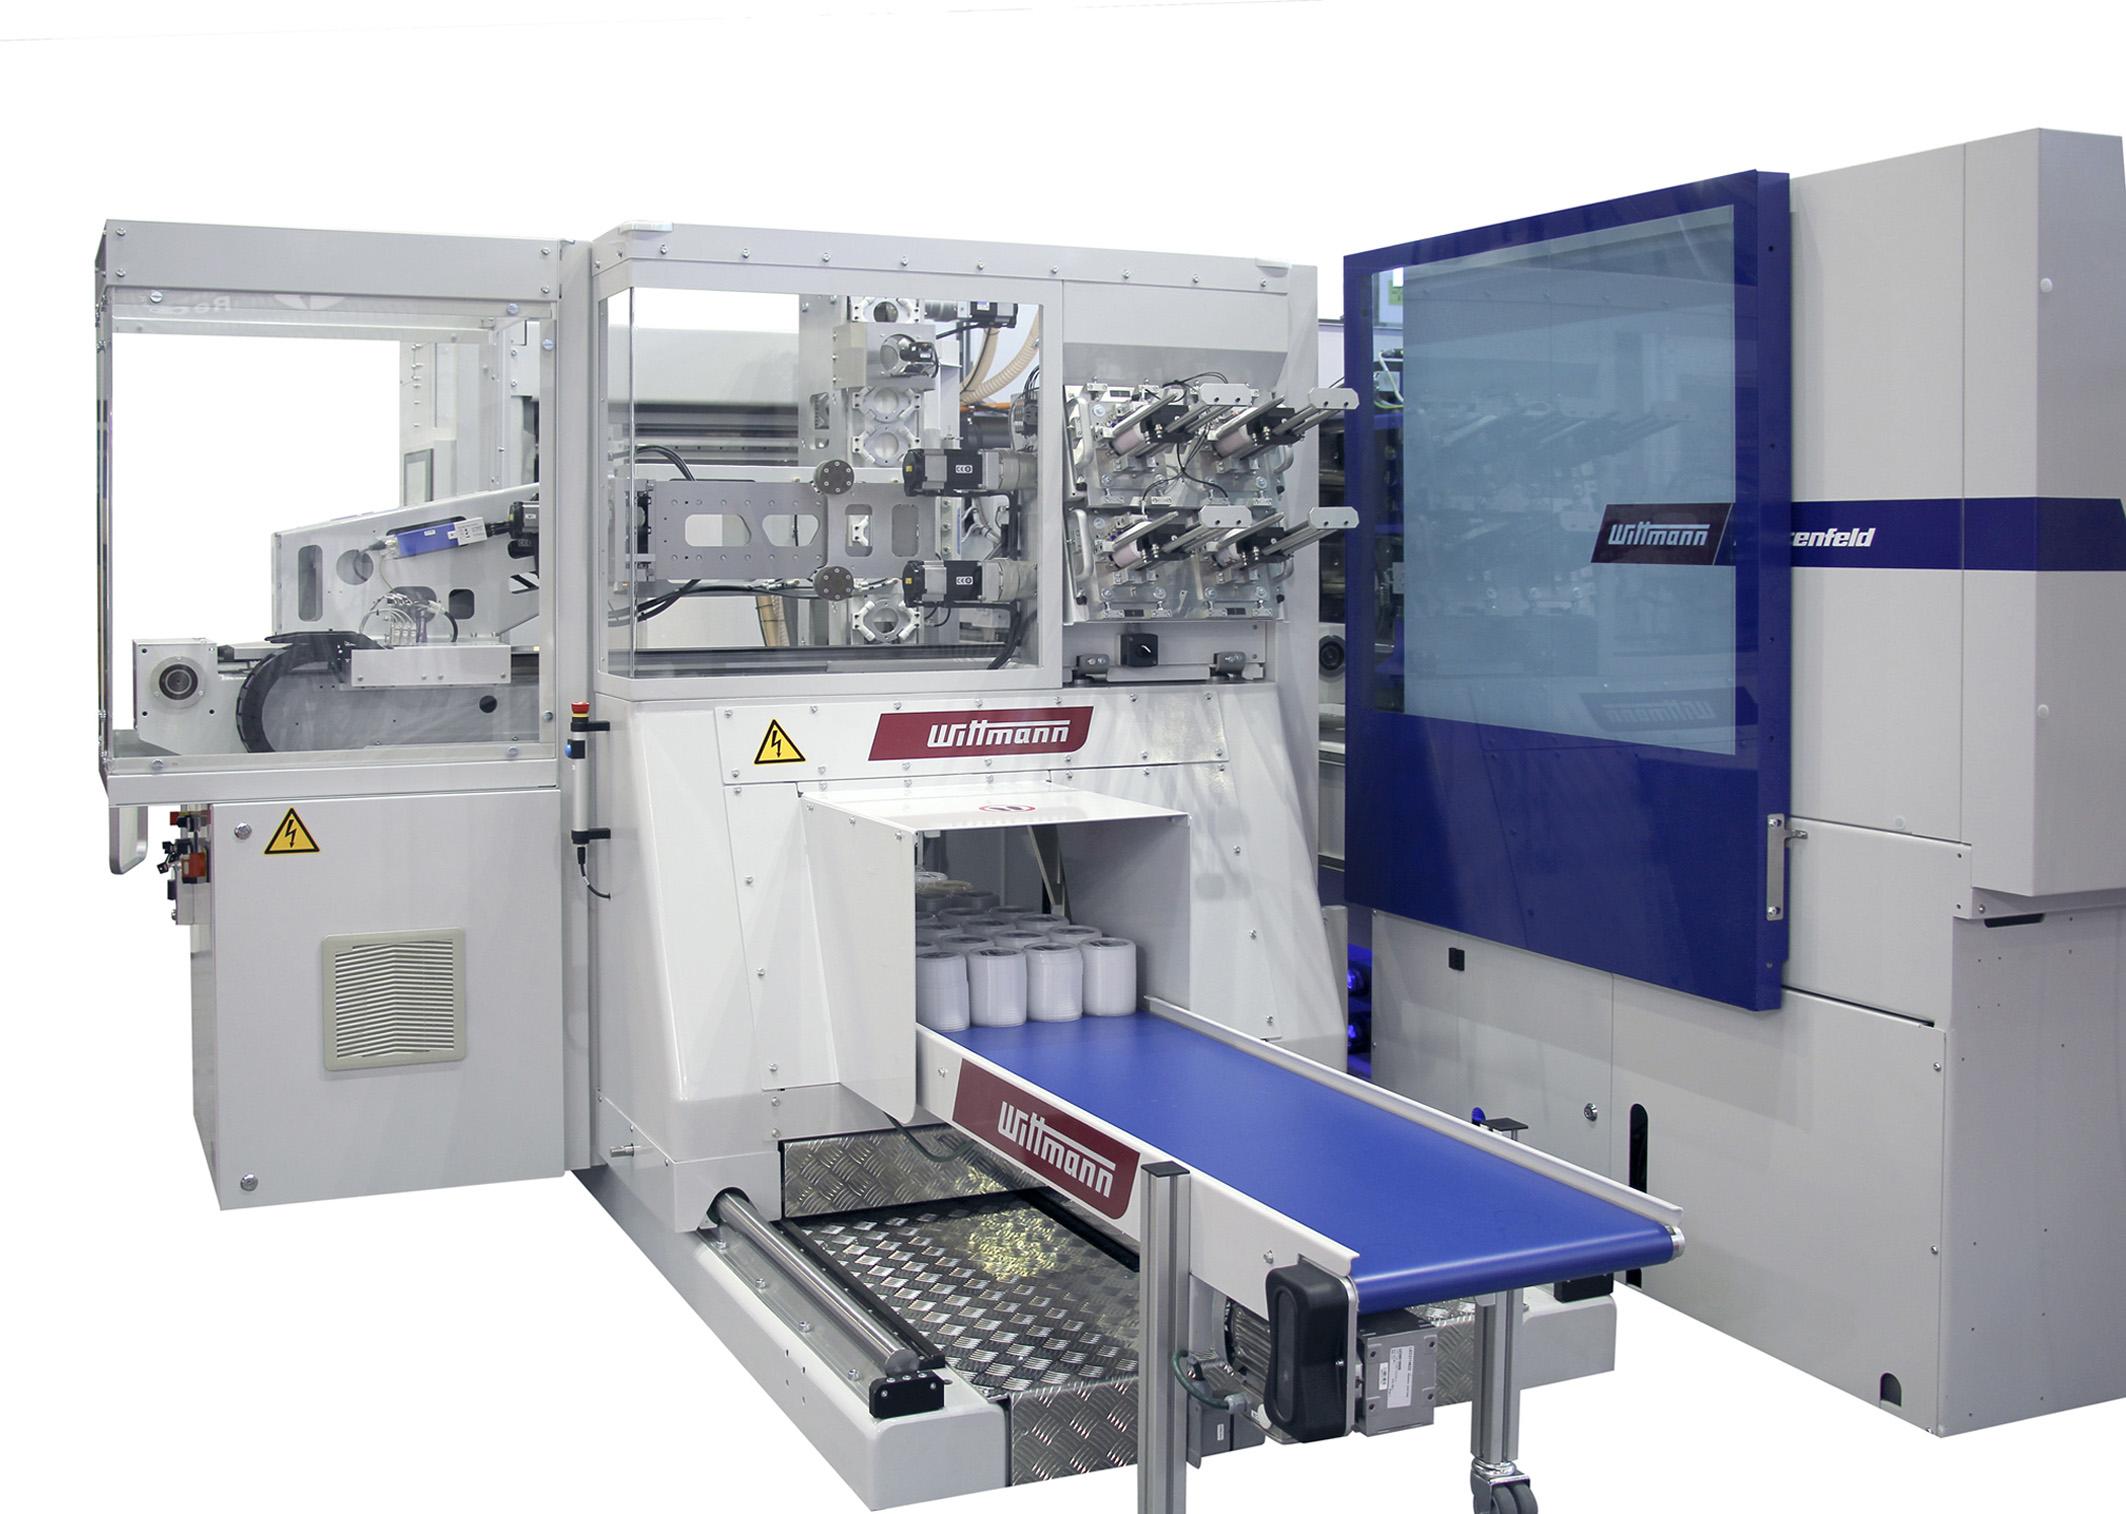 Solución de etiquetado IML de Wittmann Battenfeld, en Plastimagen 2019